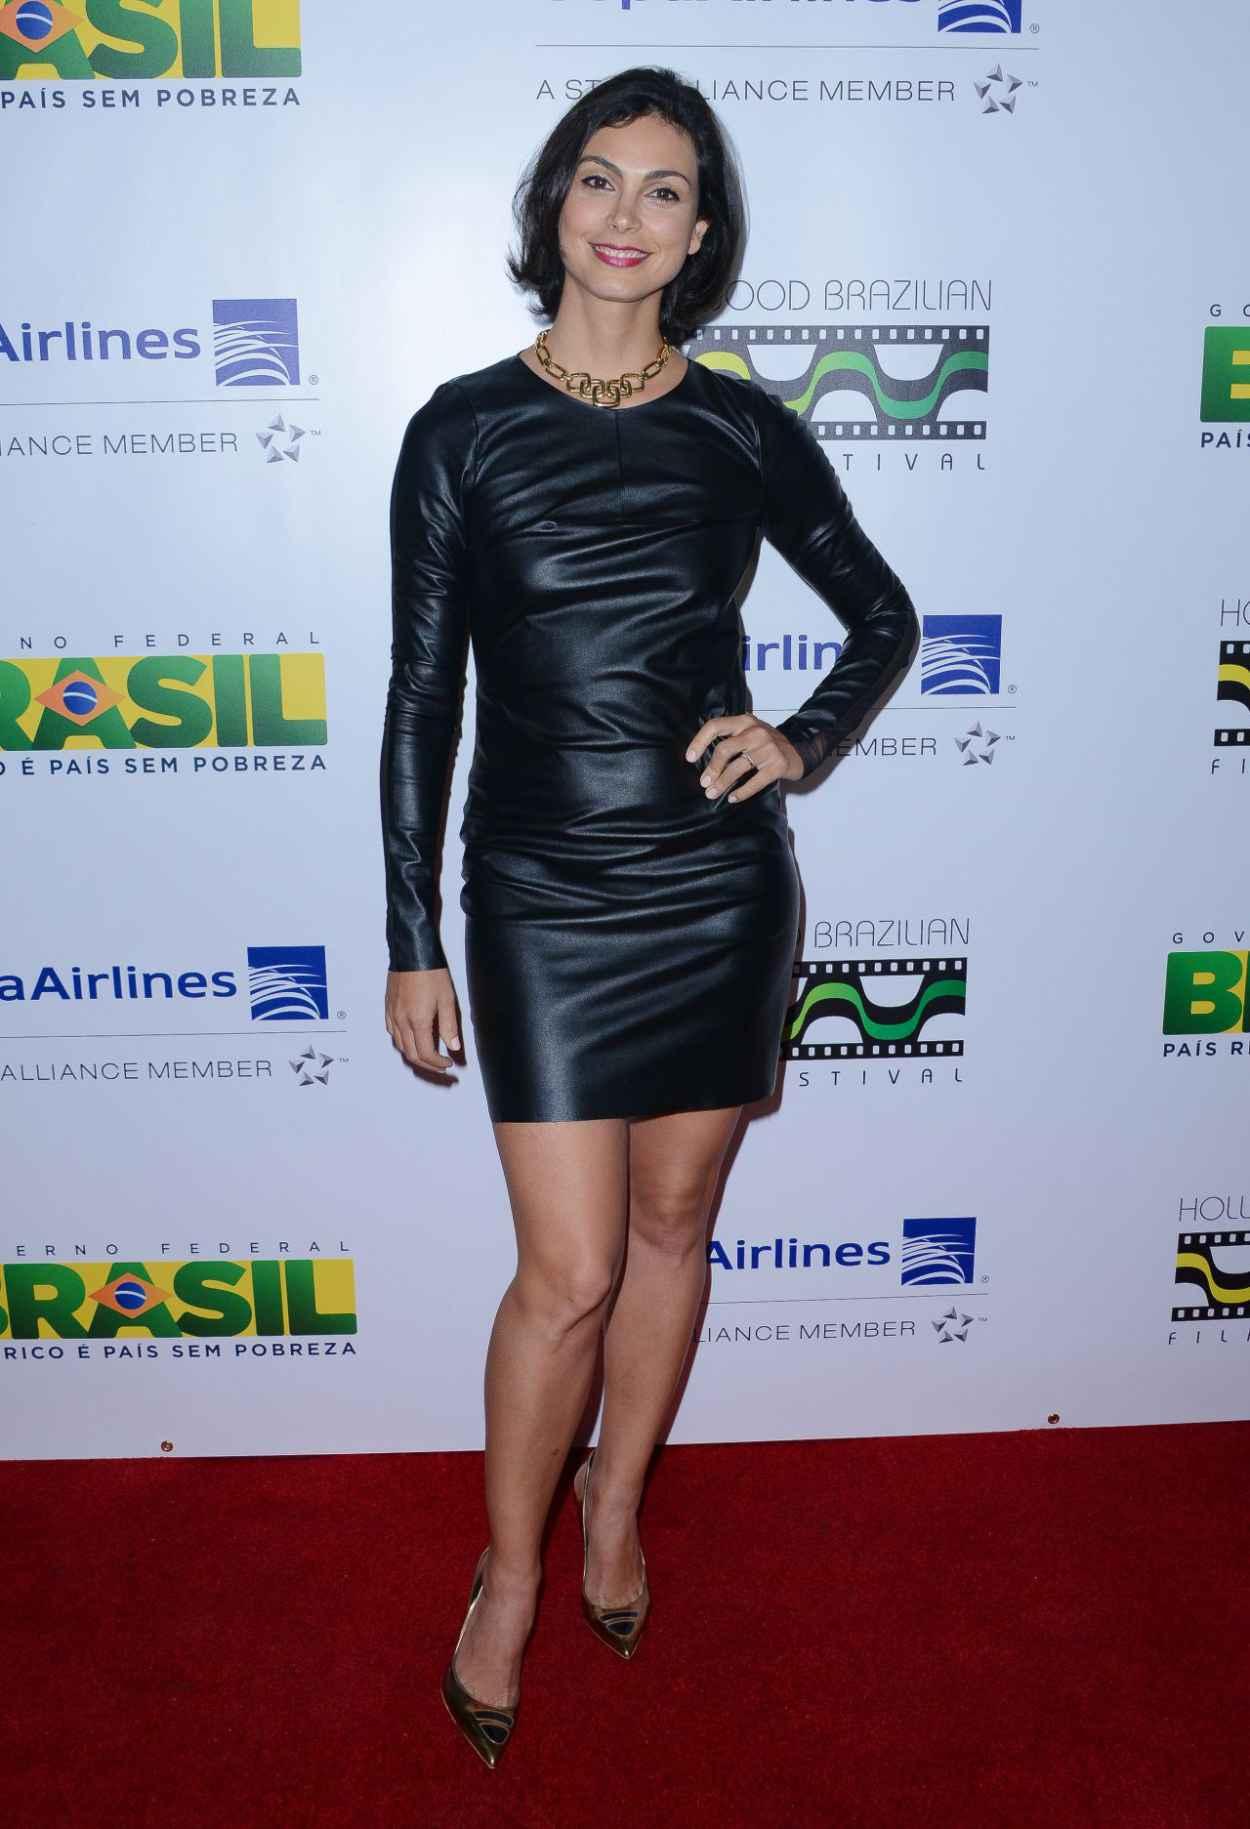 Morena Baccarin - 2015 Hollywood Brazilian Film Festival Opening Night Gala-1